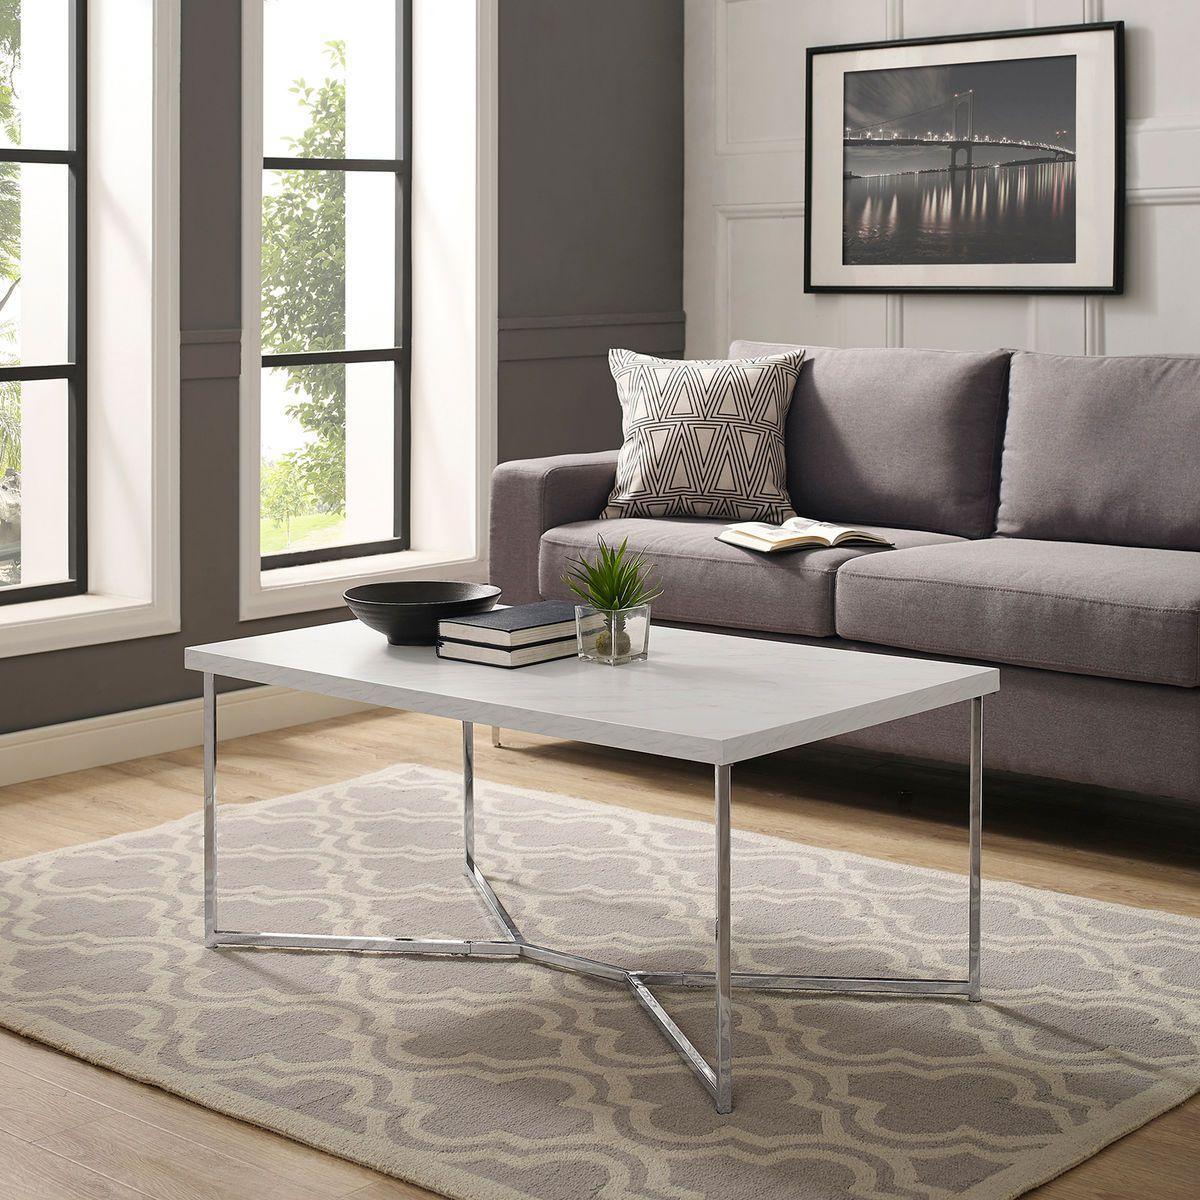 Chrome Faux Marble Y Leg Coffee Table Pier 1 Imports Coffee Table Round Wood Coffee Table Faux Marble Coffee Table [ 1200 x 1200 Pixel ]